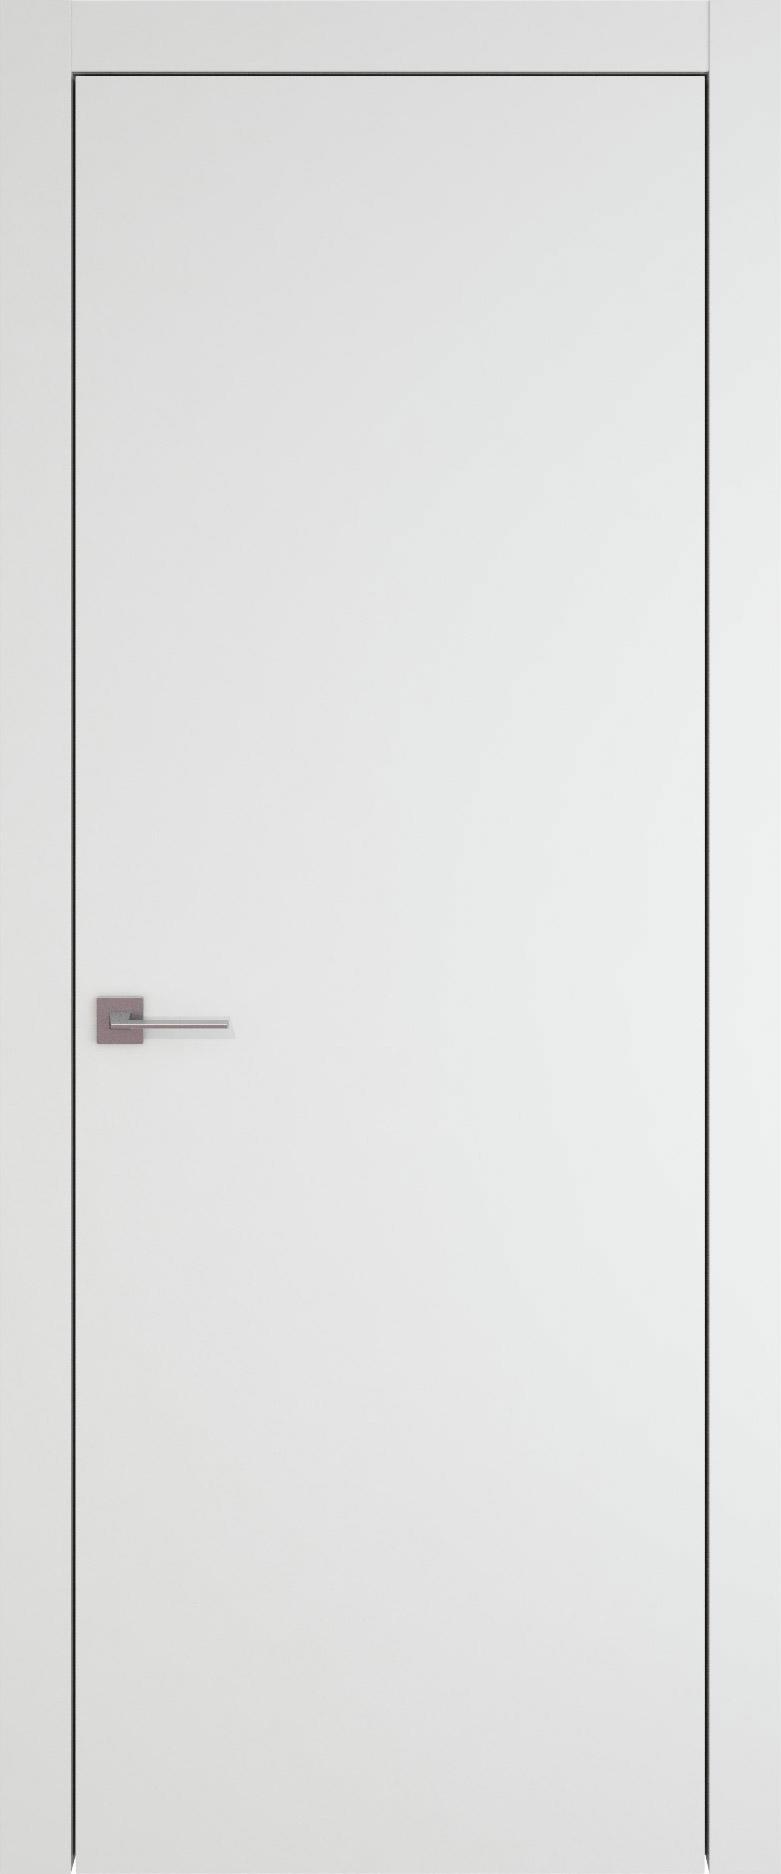 Tivoli А-1 цвет - Белая эмаль (RAL 9003) Без стекла (ДГ)